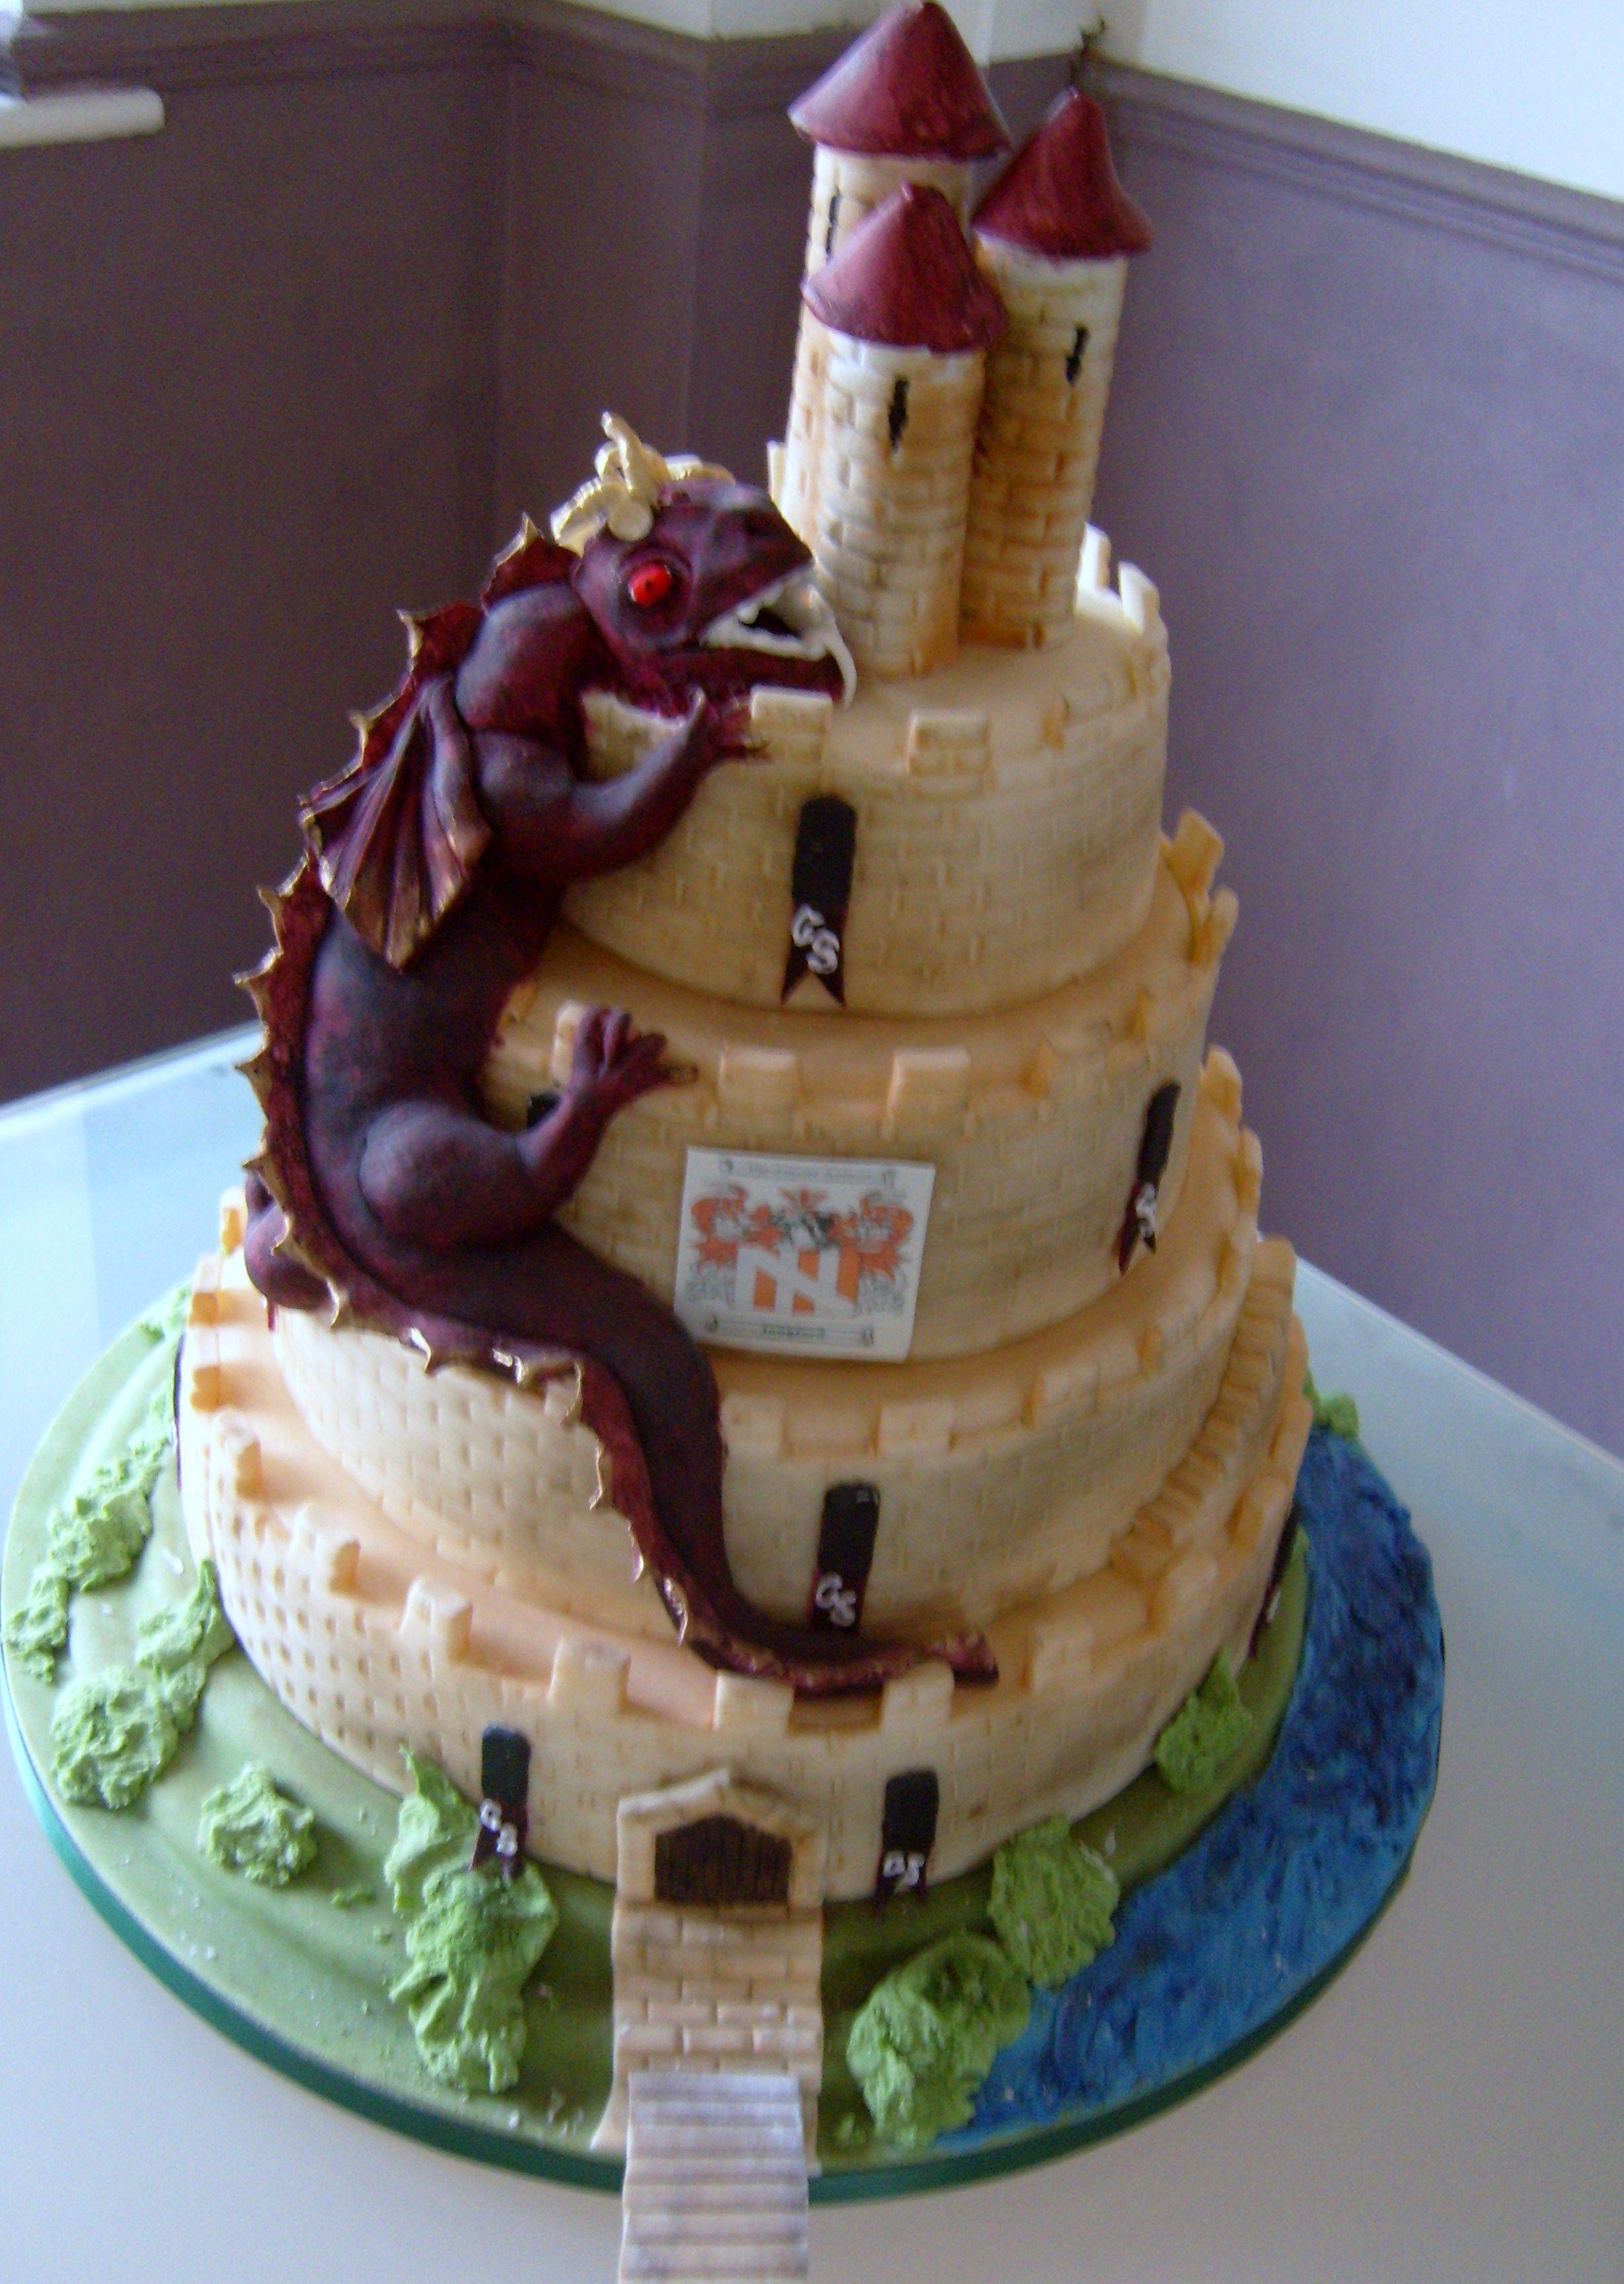 Marvelous Male Birthday Cakes Bedfordshire Hertfordshire Buckinghamshire Funny Birthday Cards Online Overcheapnameinfo